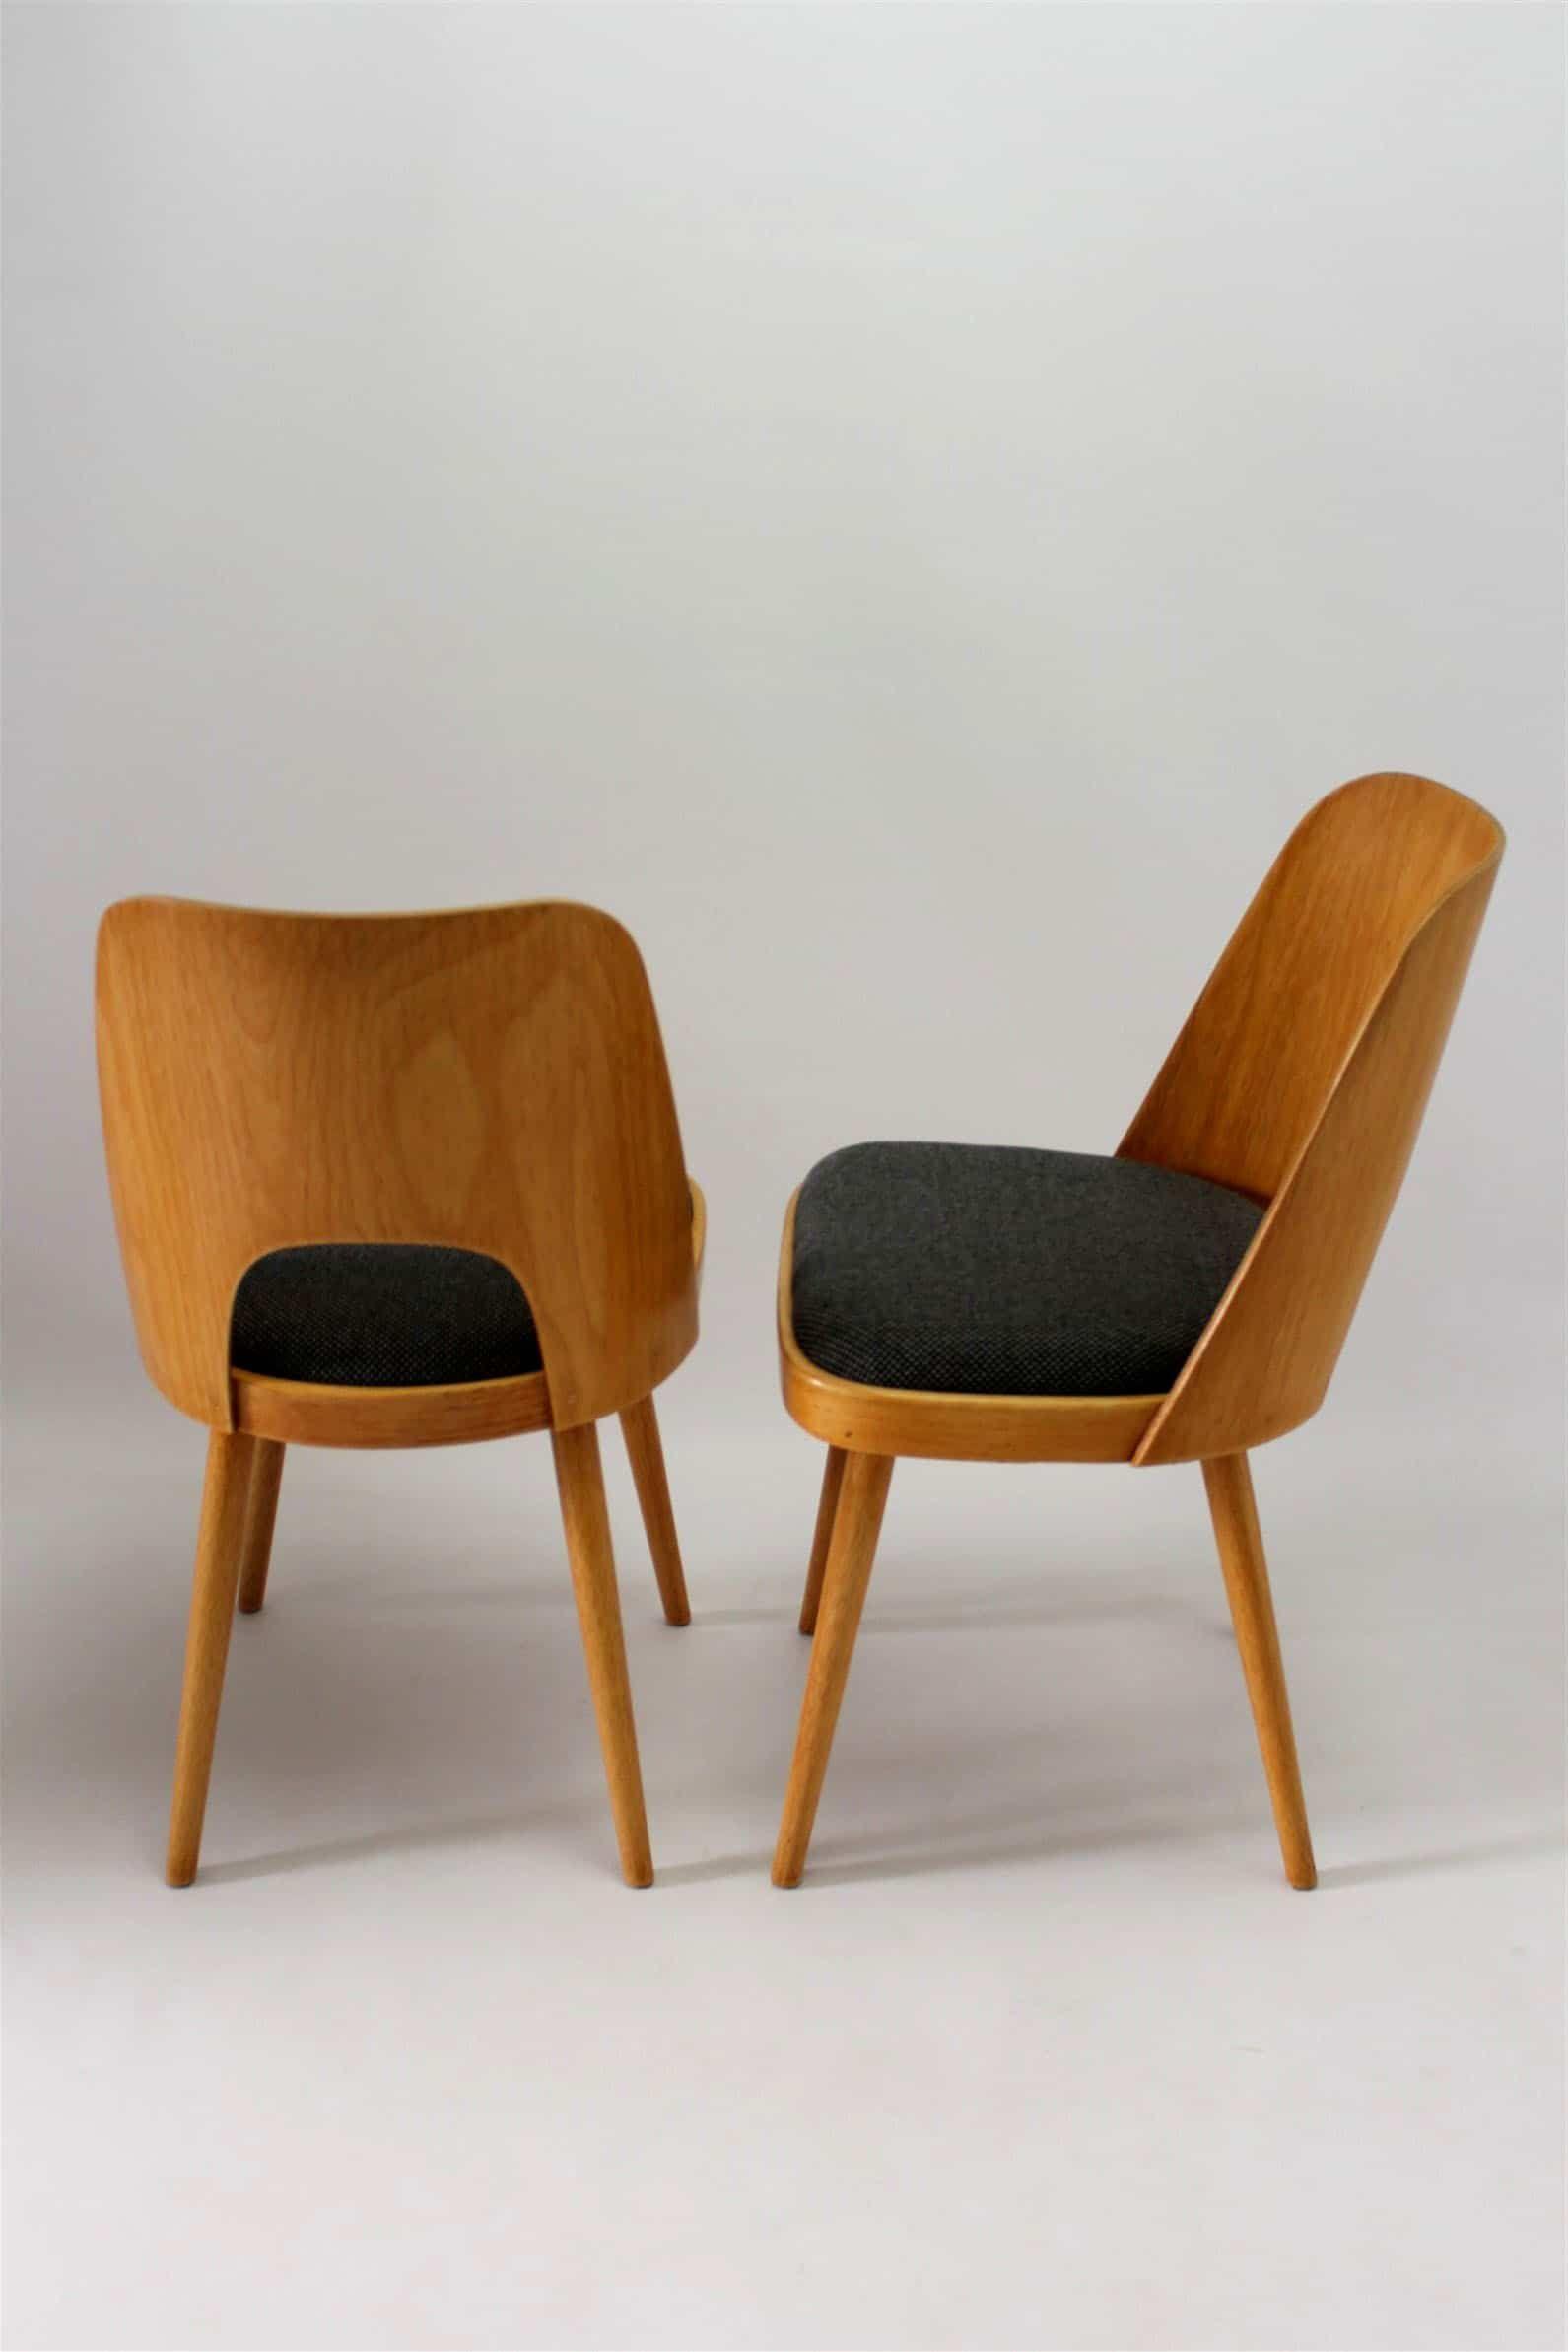 Para krzeseł TON proj O Haerdtl lata 50